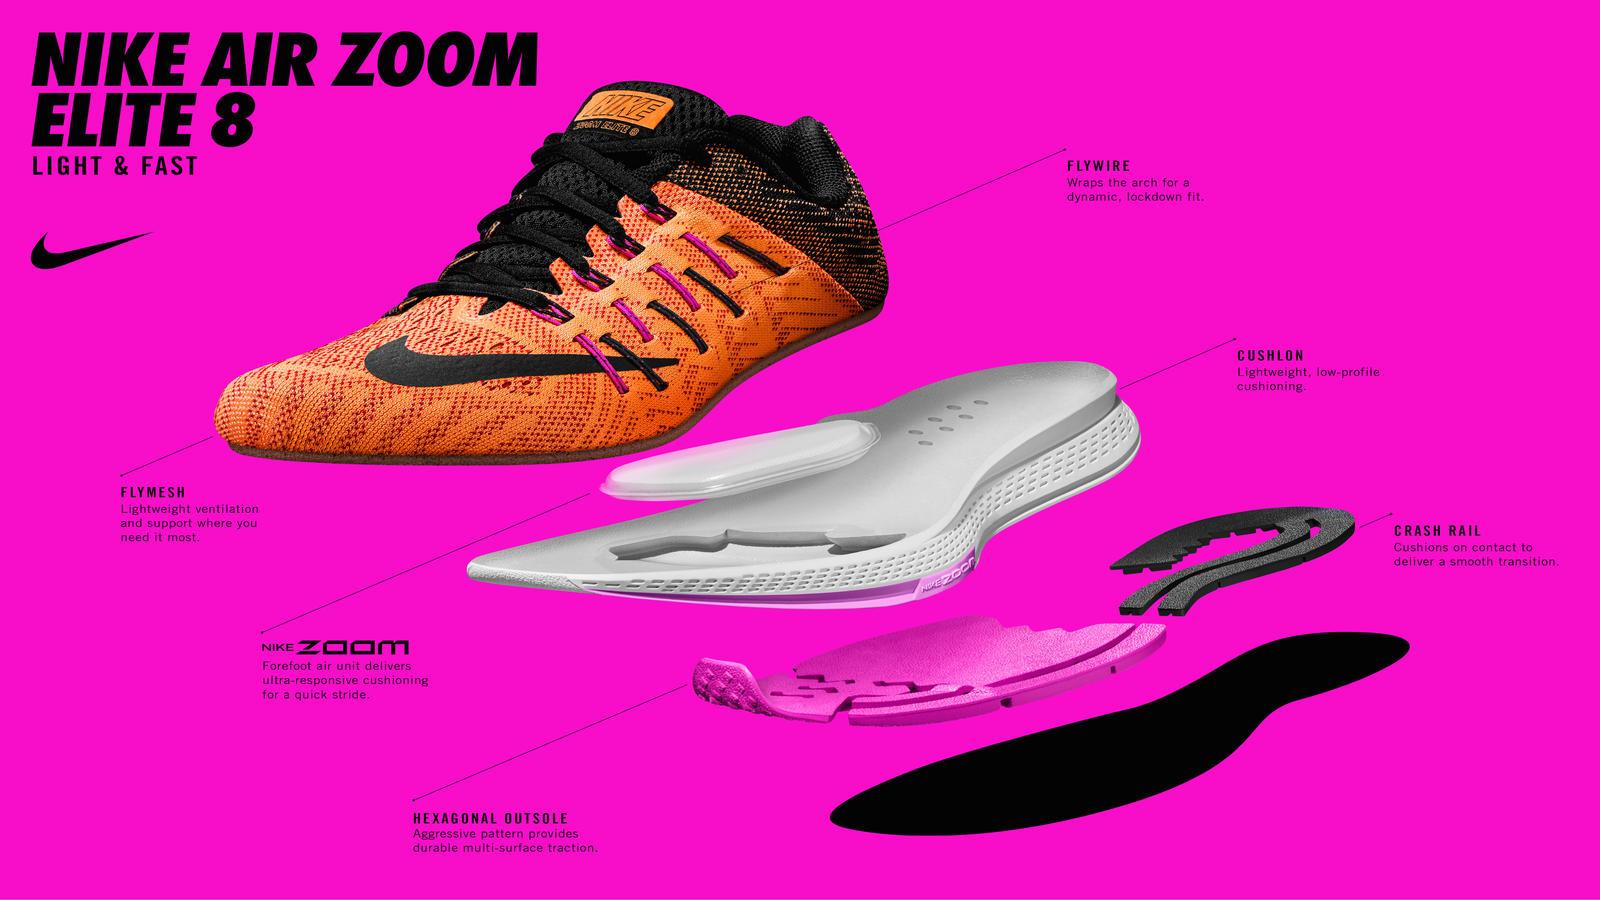 Robusto concerto Principiante  Nike Air Zoom Elite 8: Low, Sleek, Fast and Light - Nike News